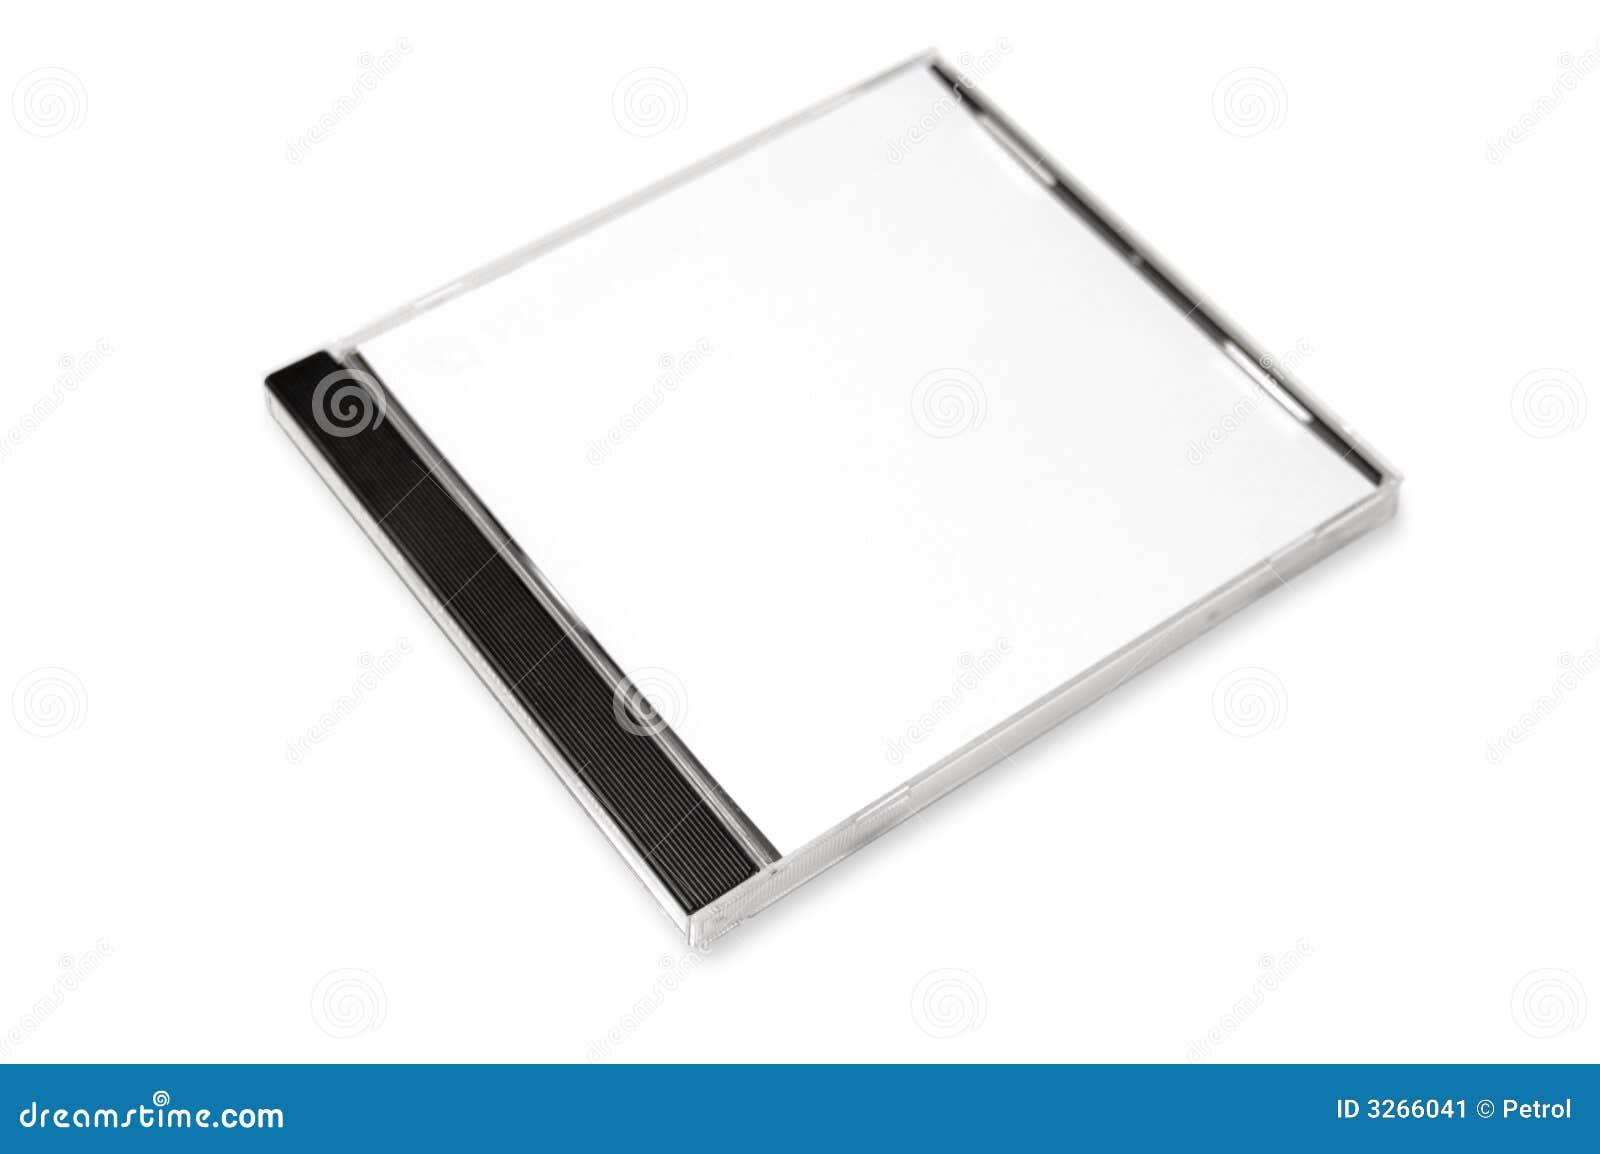 CD Case Stock Image - Image: 3266041